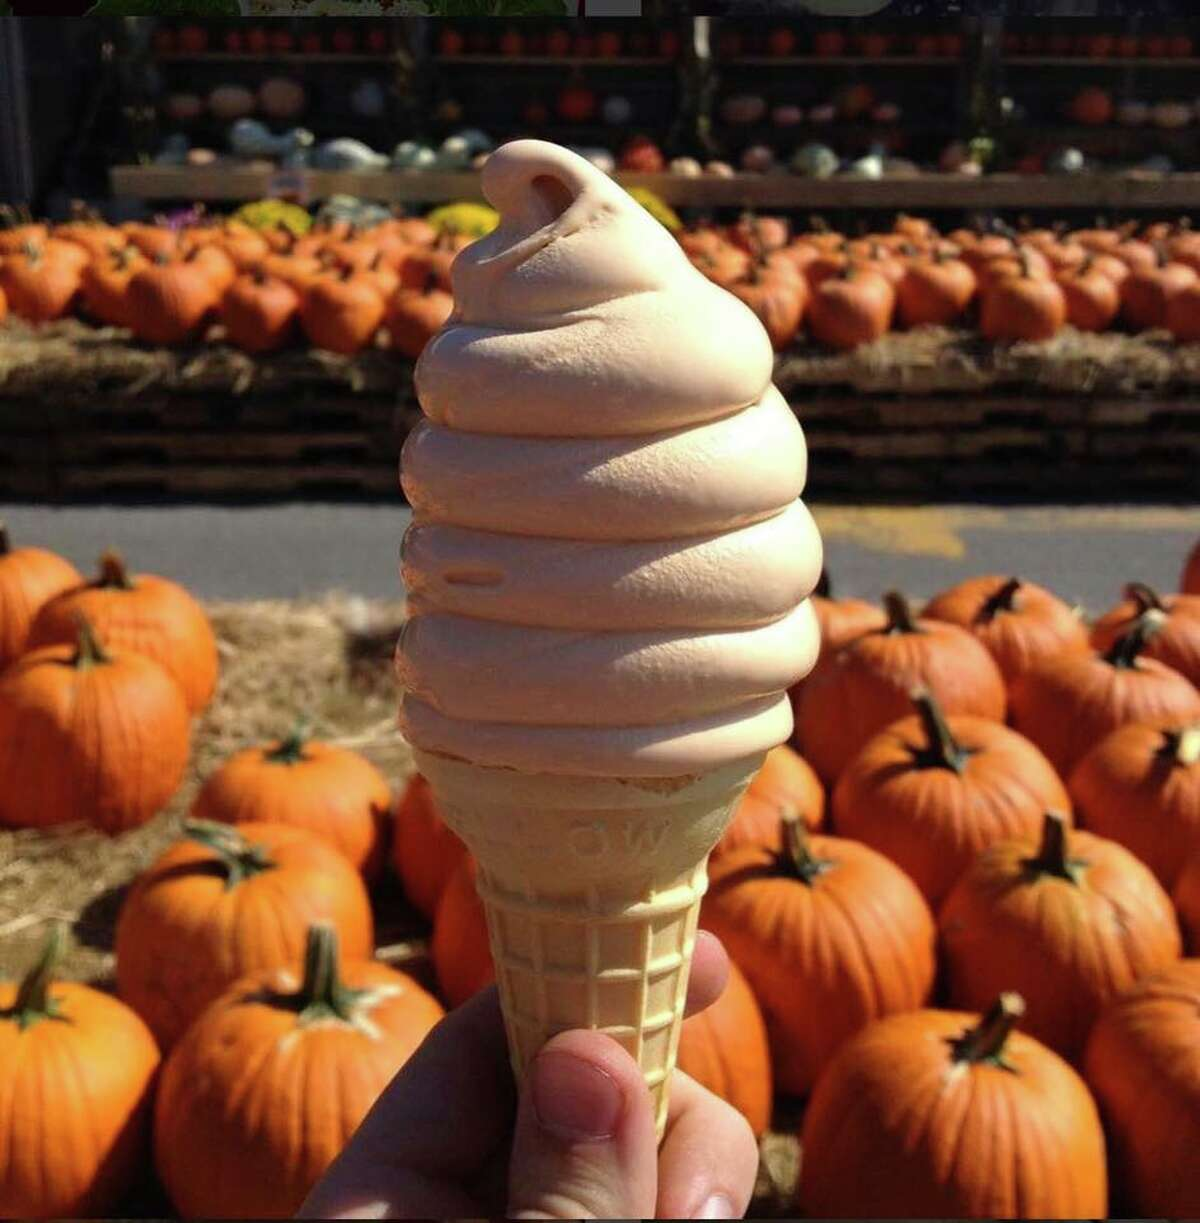 Pumpkin soft serve With Stew Leonard's locations in Danbury, Norwalk and Newington, pumpkin lovers throughout Connecticut can get their fix with pumpkin soft serve.